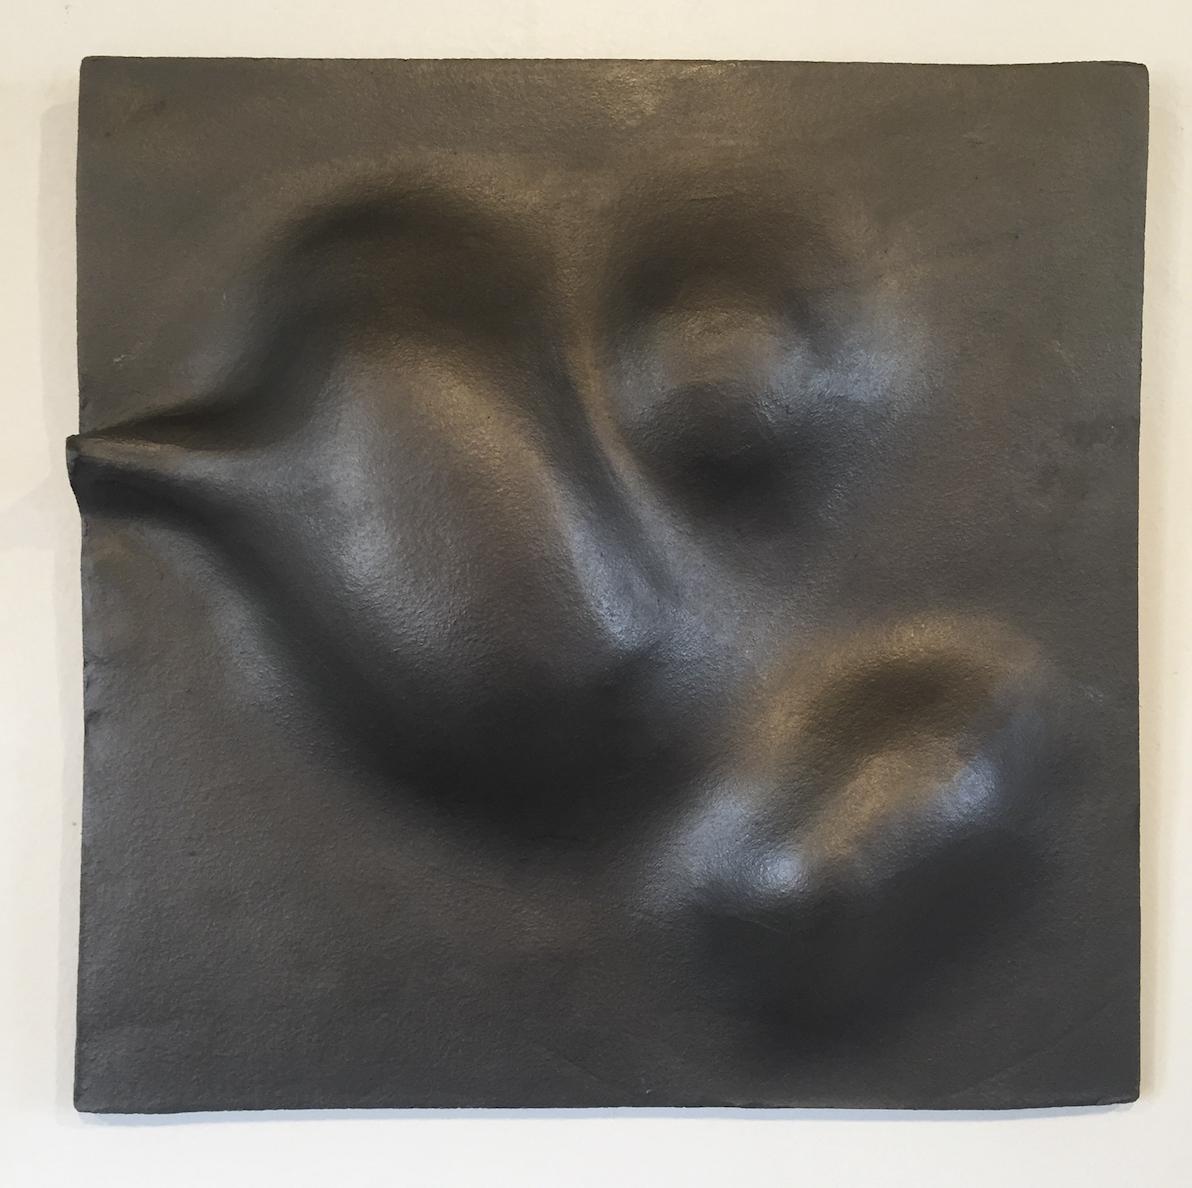 Cecily Colbert: Fertile Ground